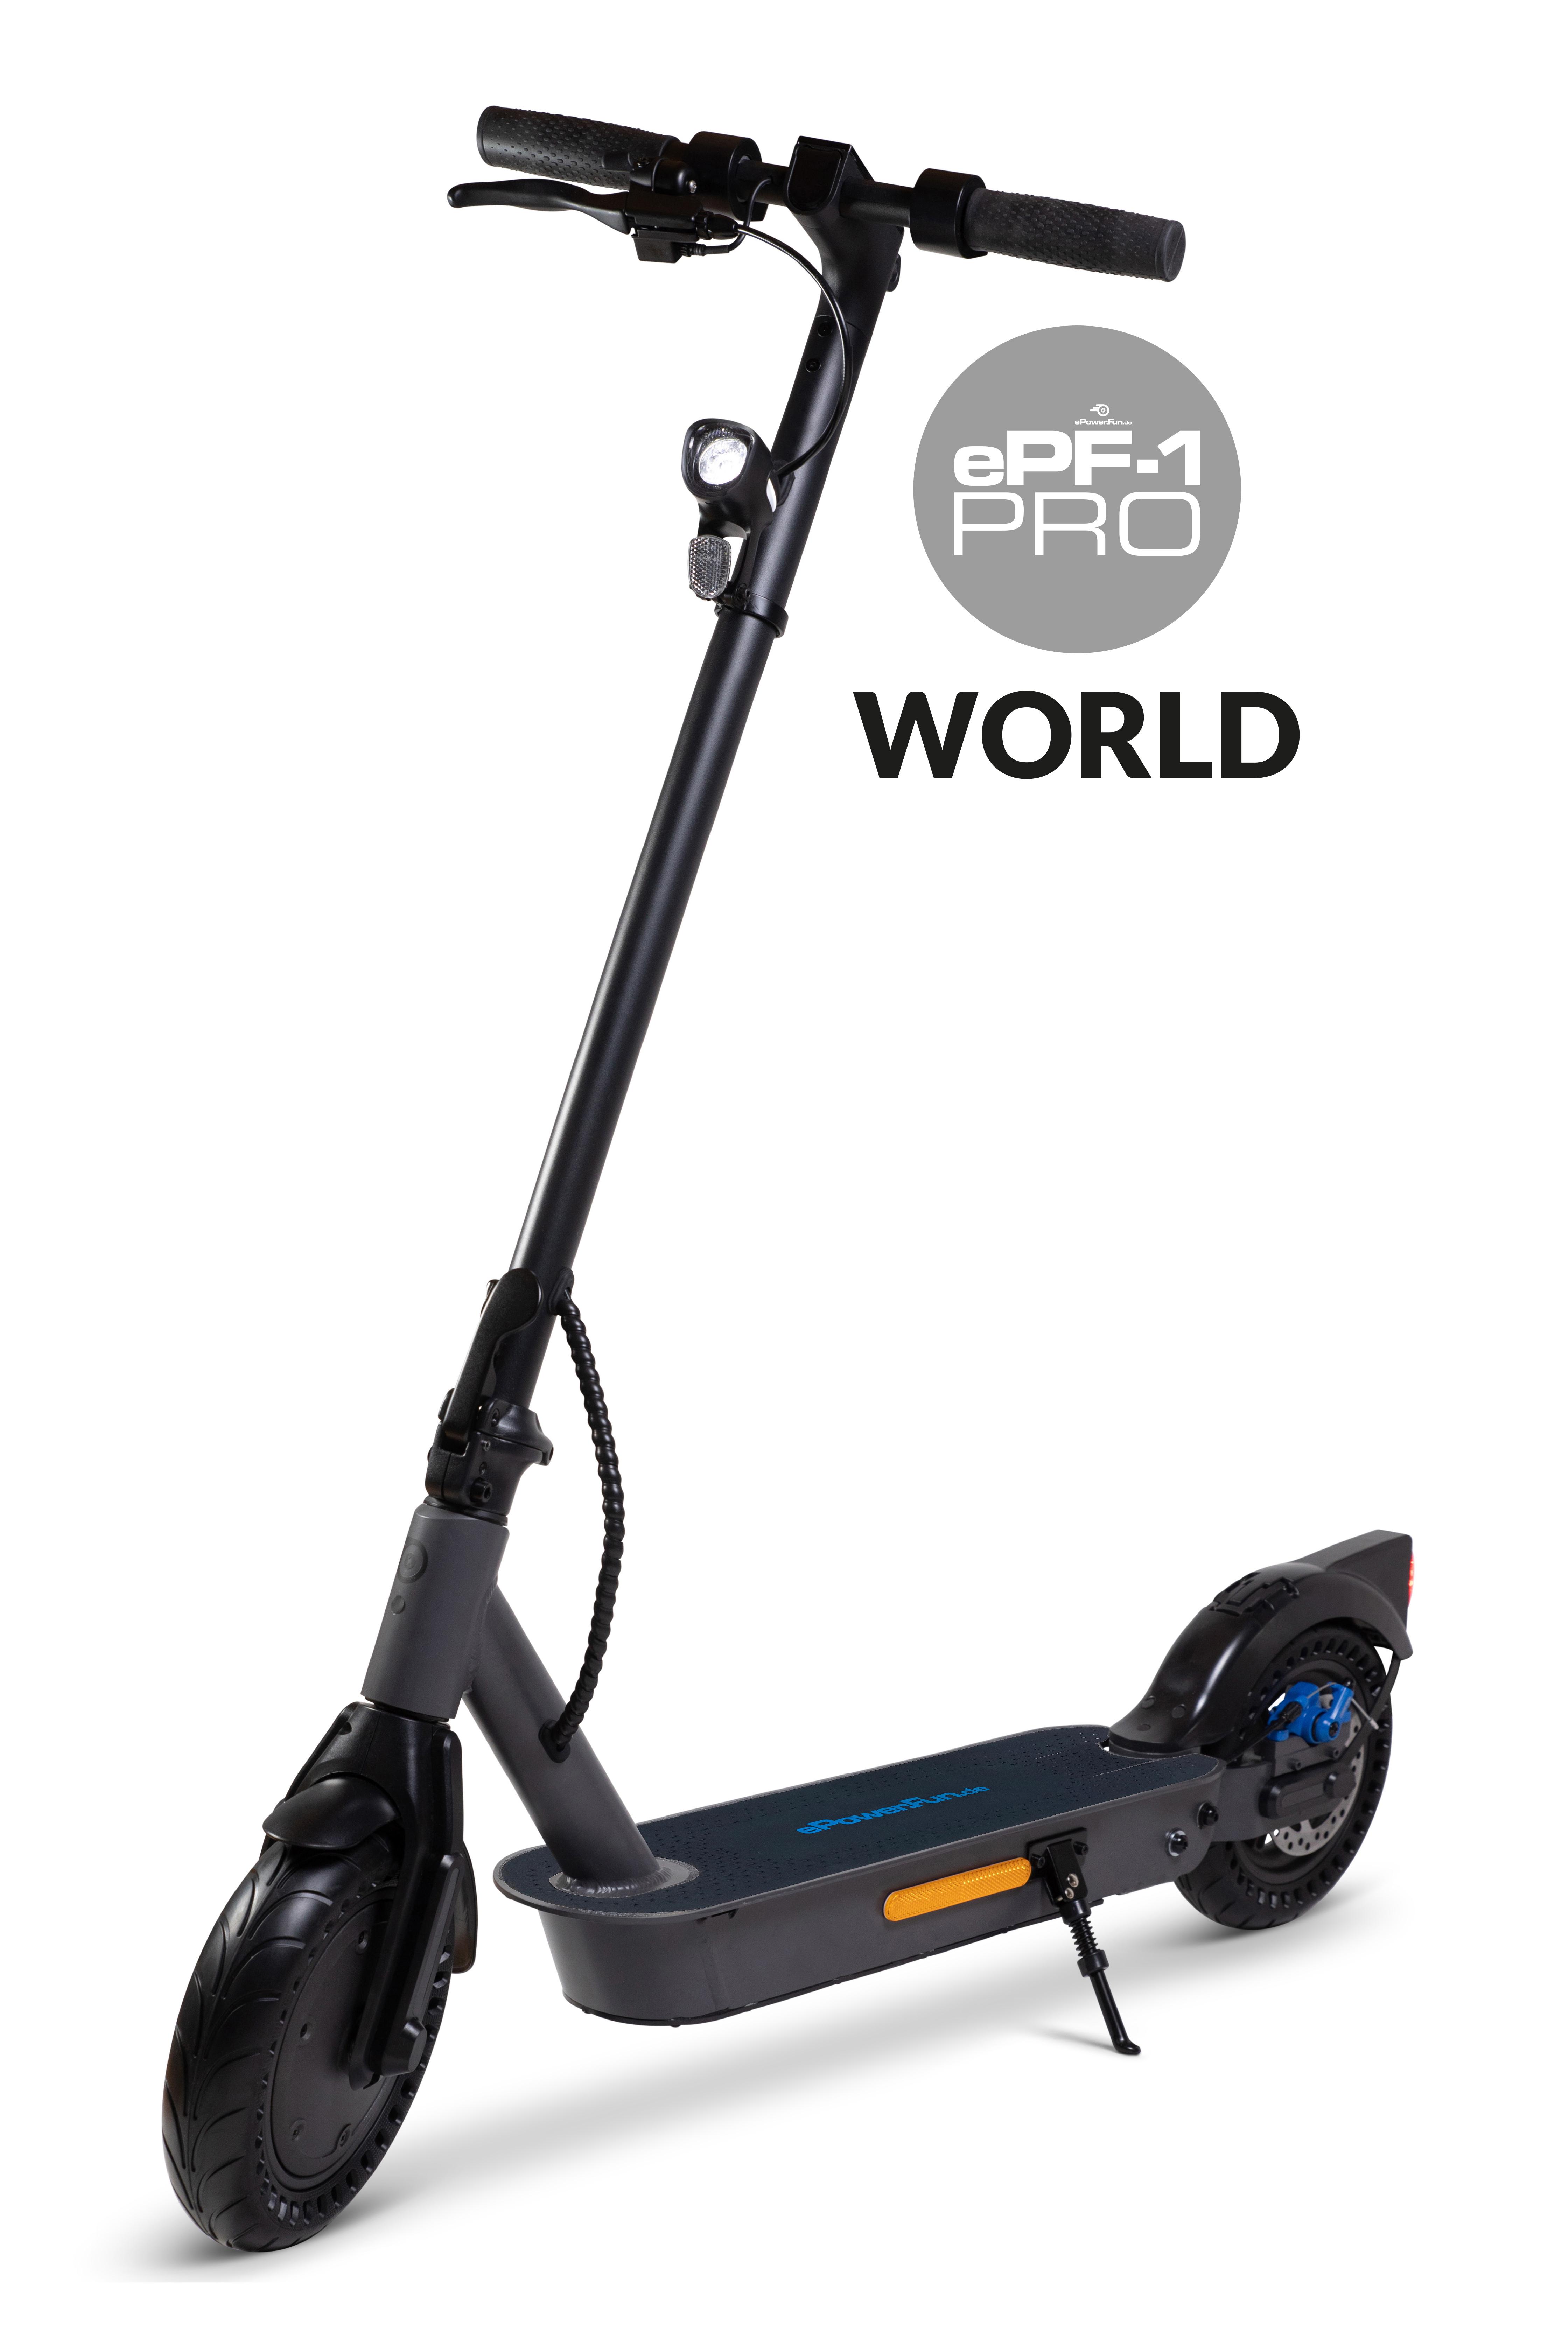 ePF-1 PRO World 31 km/h  eScooter ohne ABE BRD